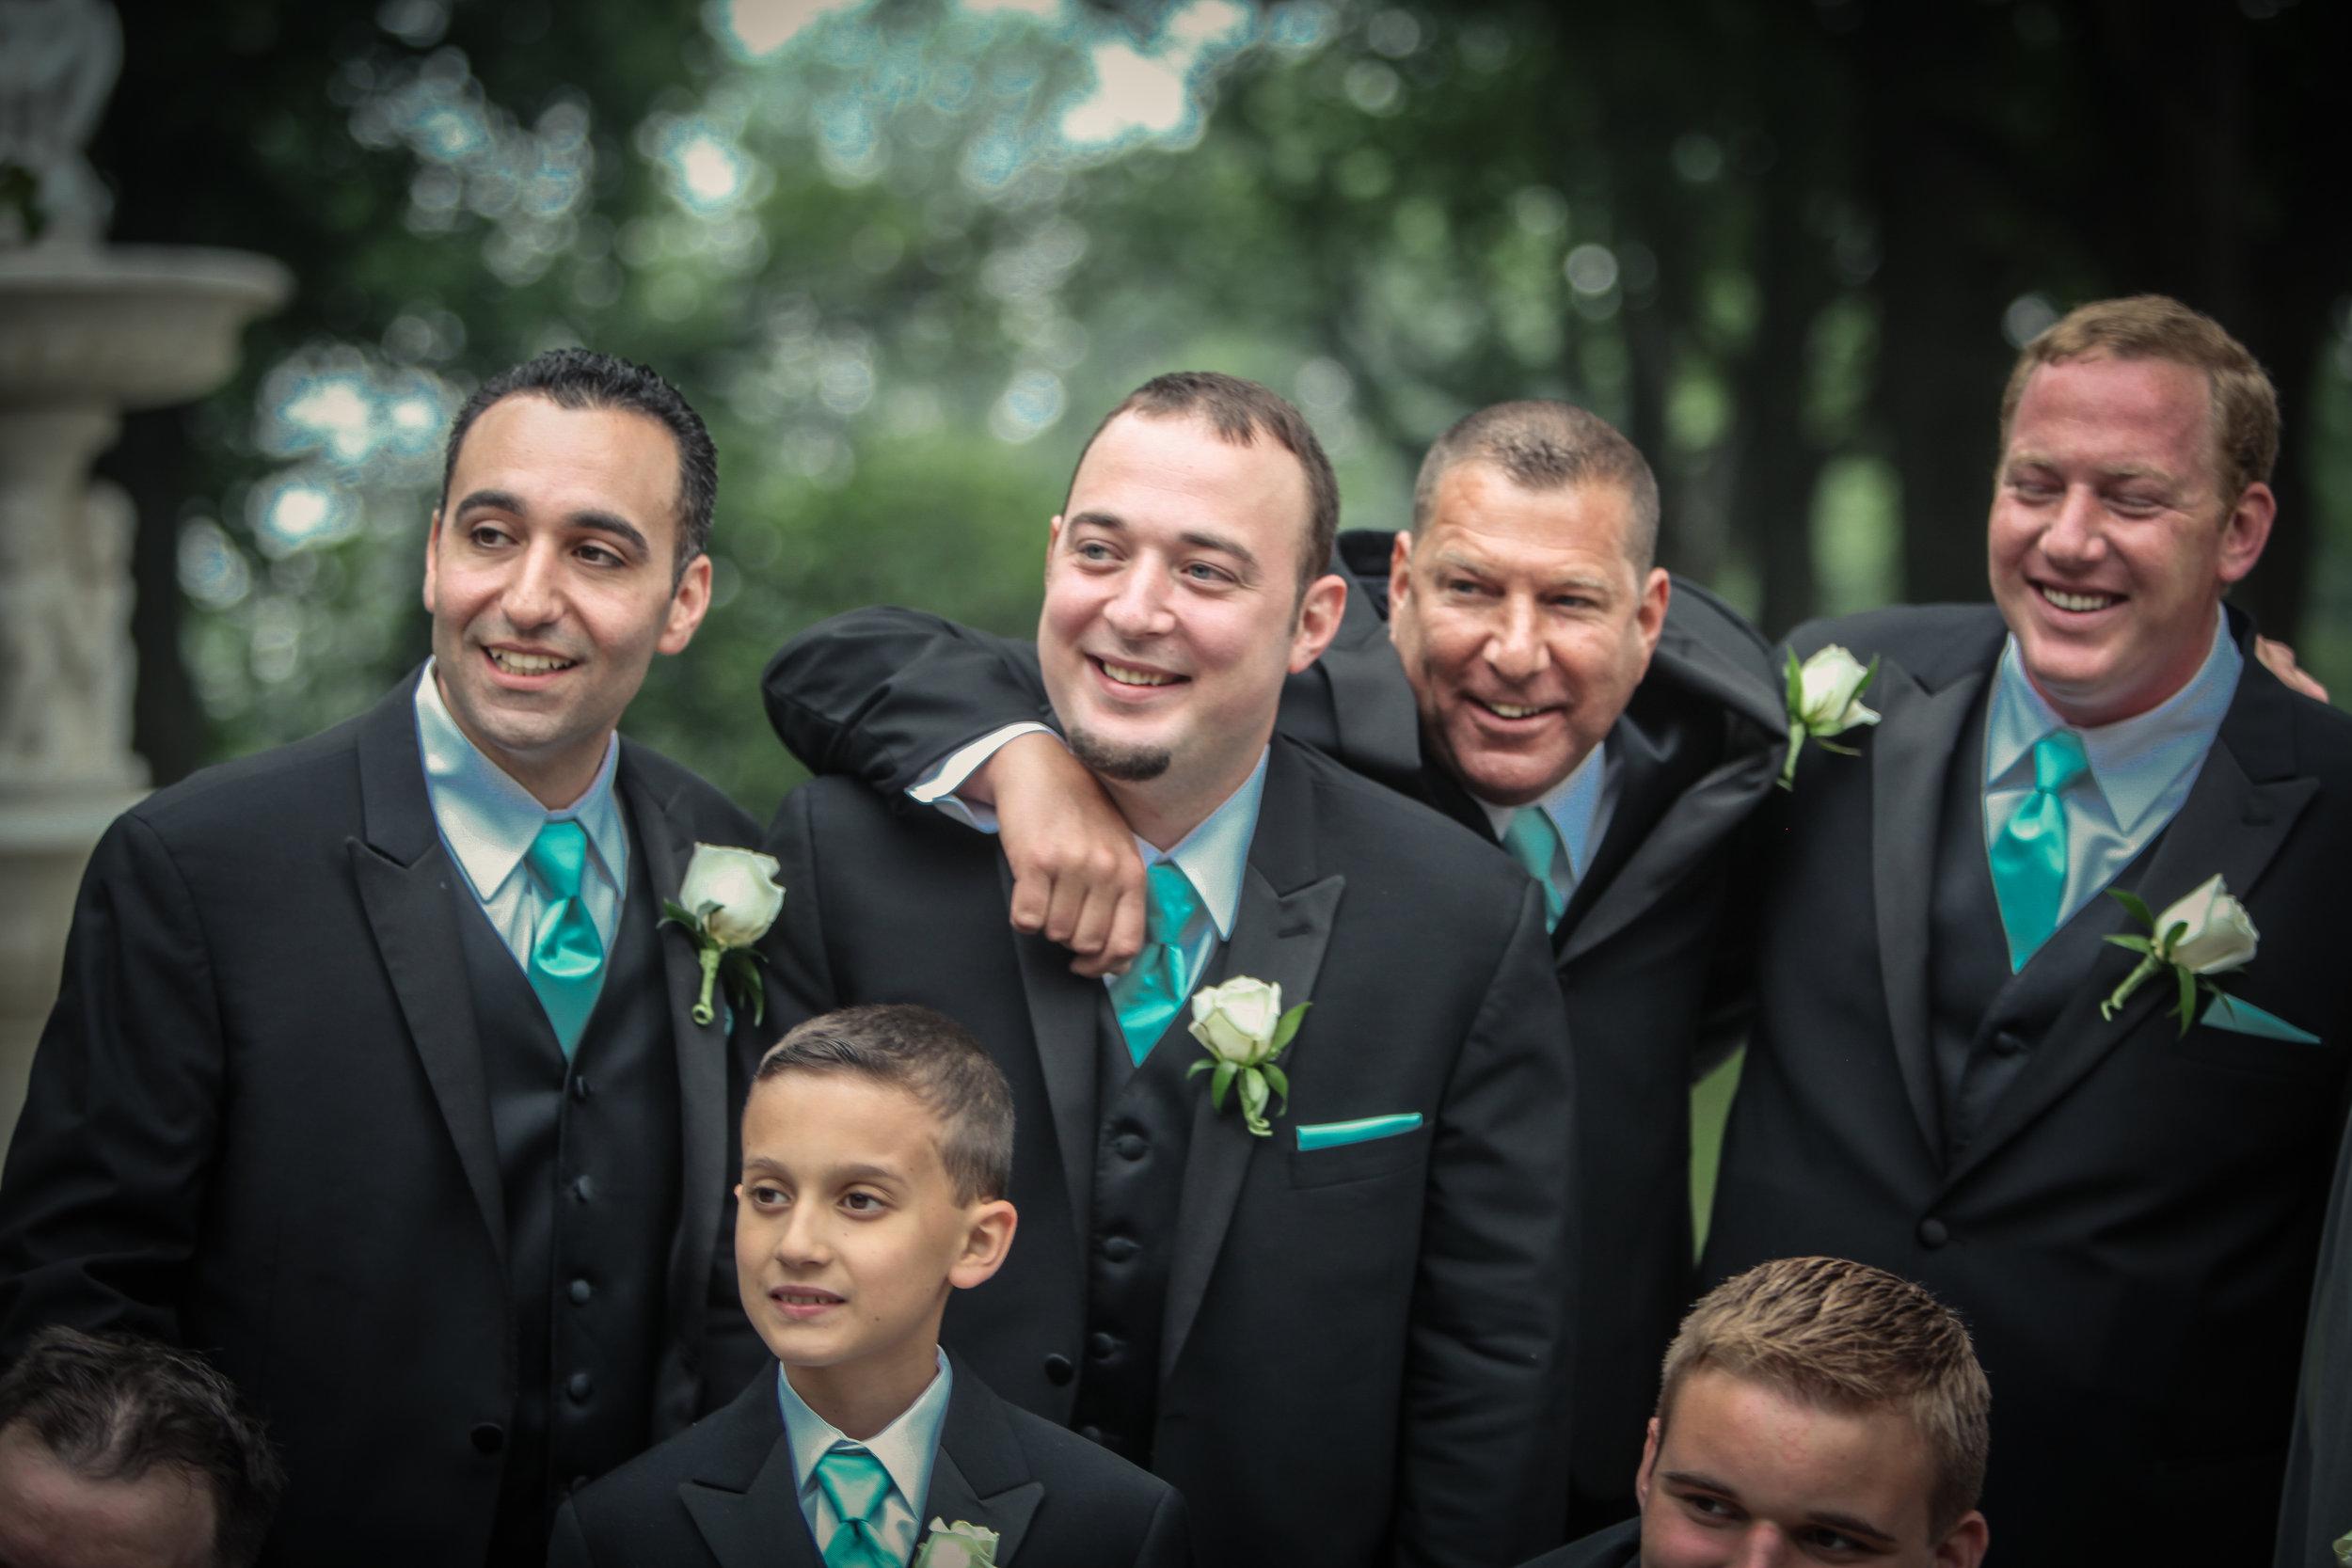 Wedding party black slim fit tuxedo